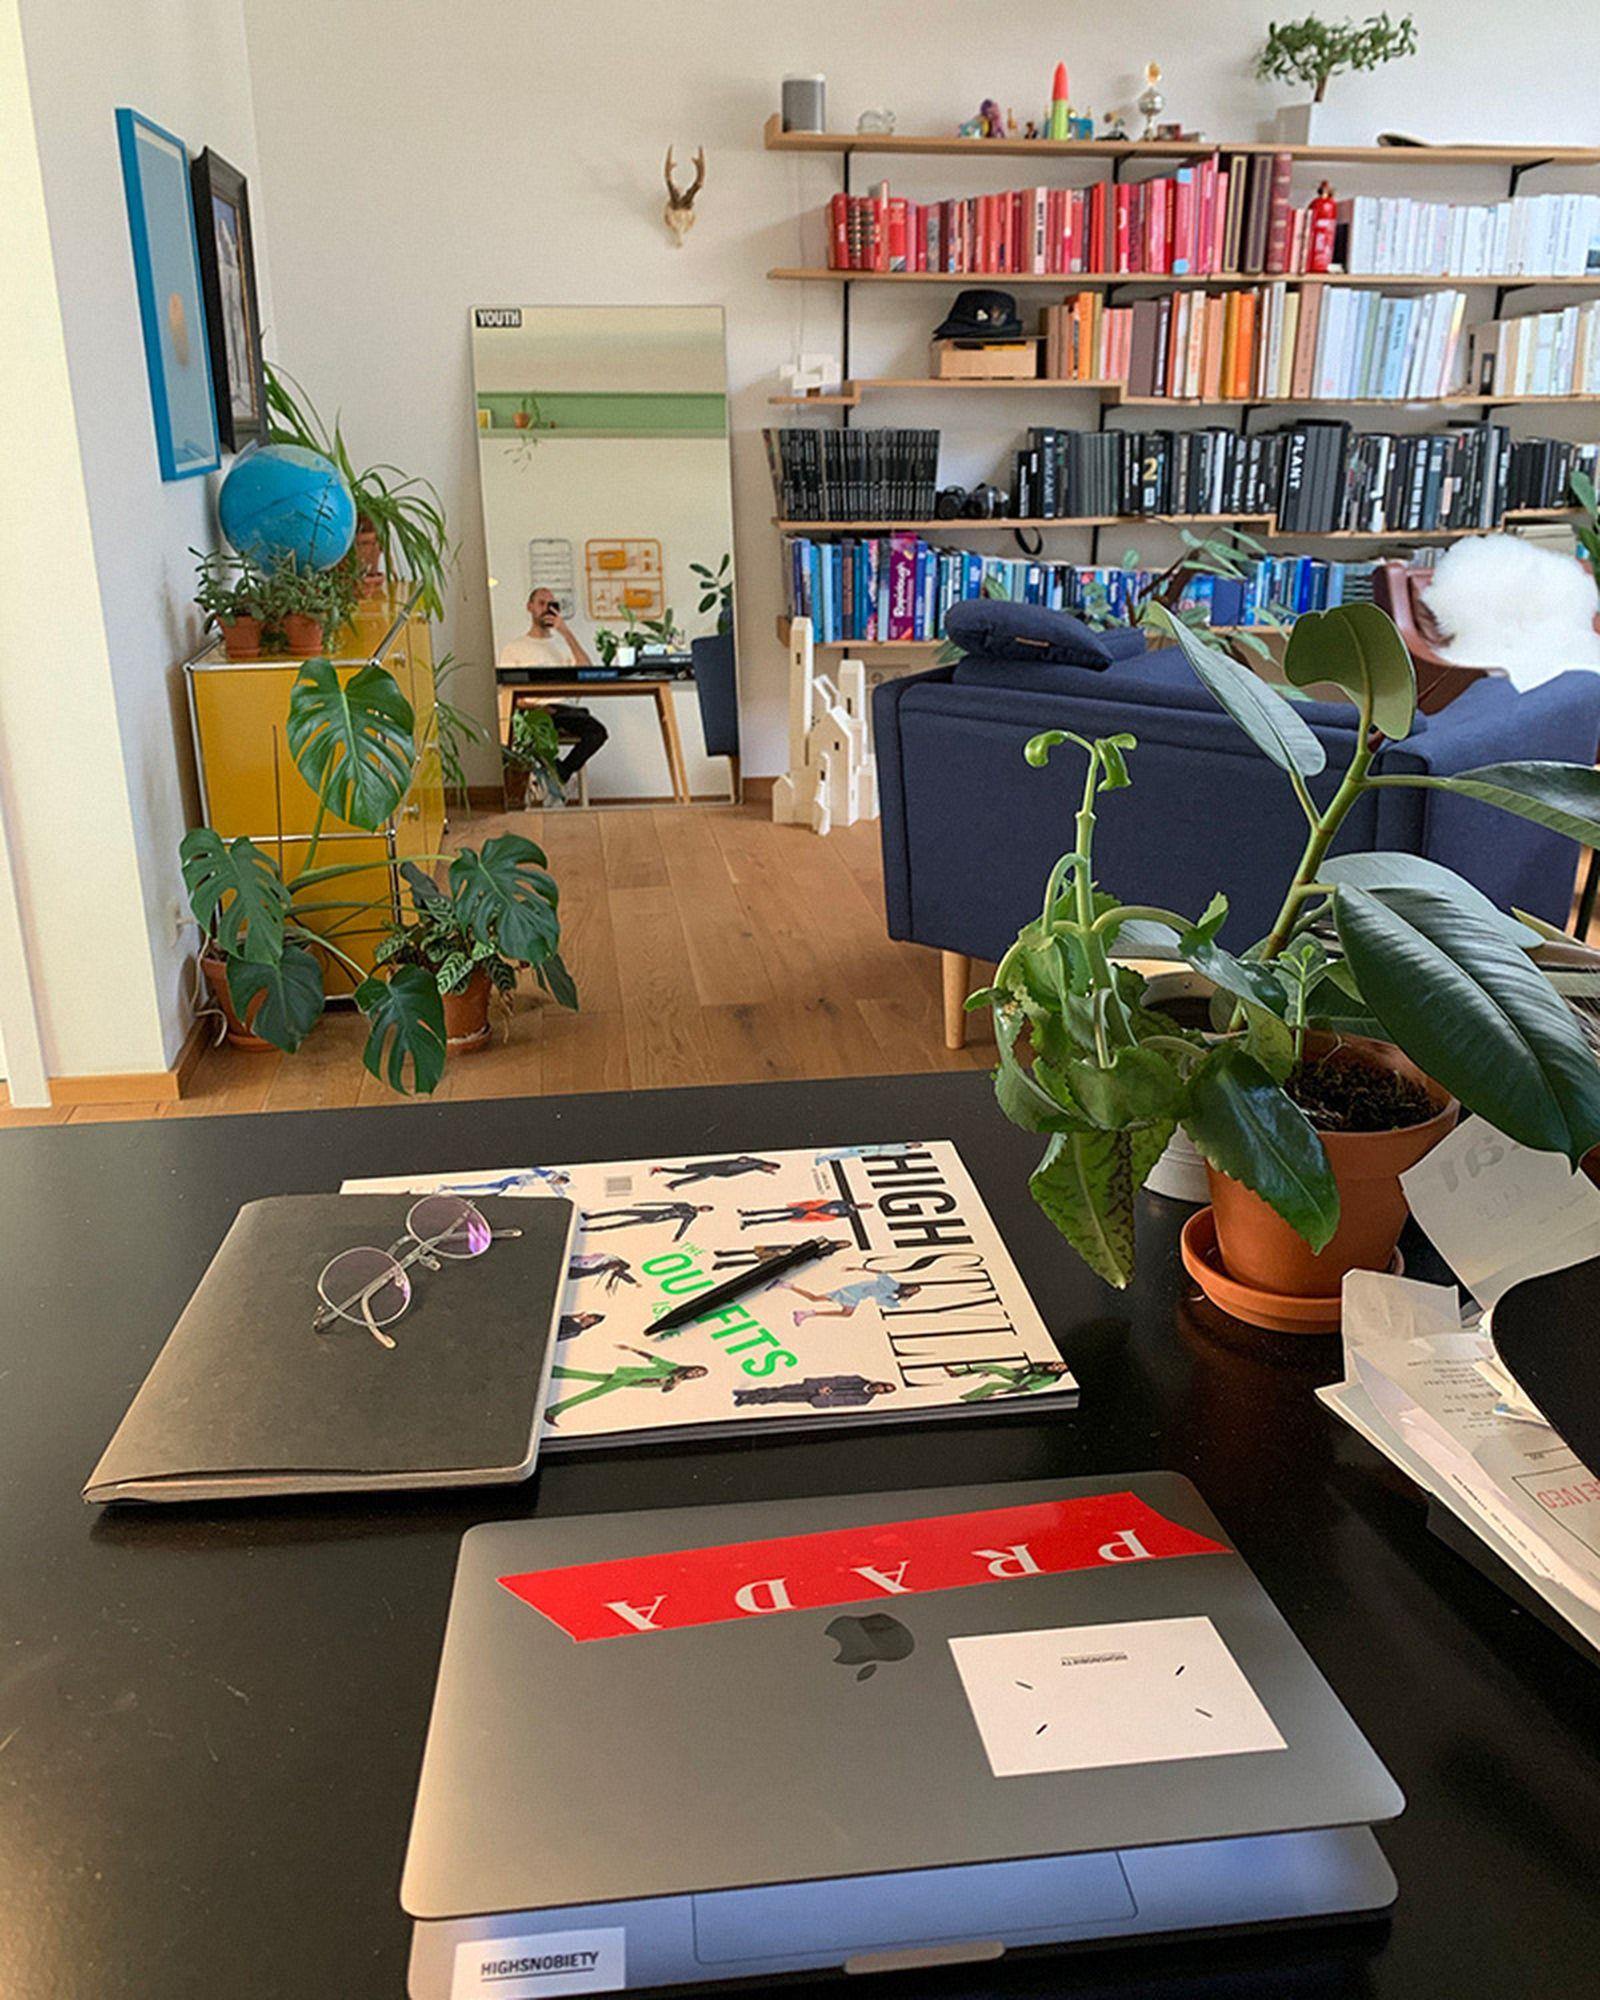 wfh-office-tour-look-inside-home-offices-herbert-04